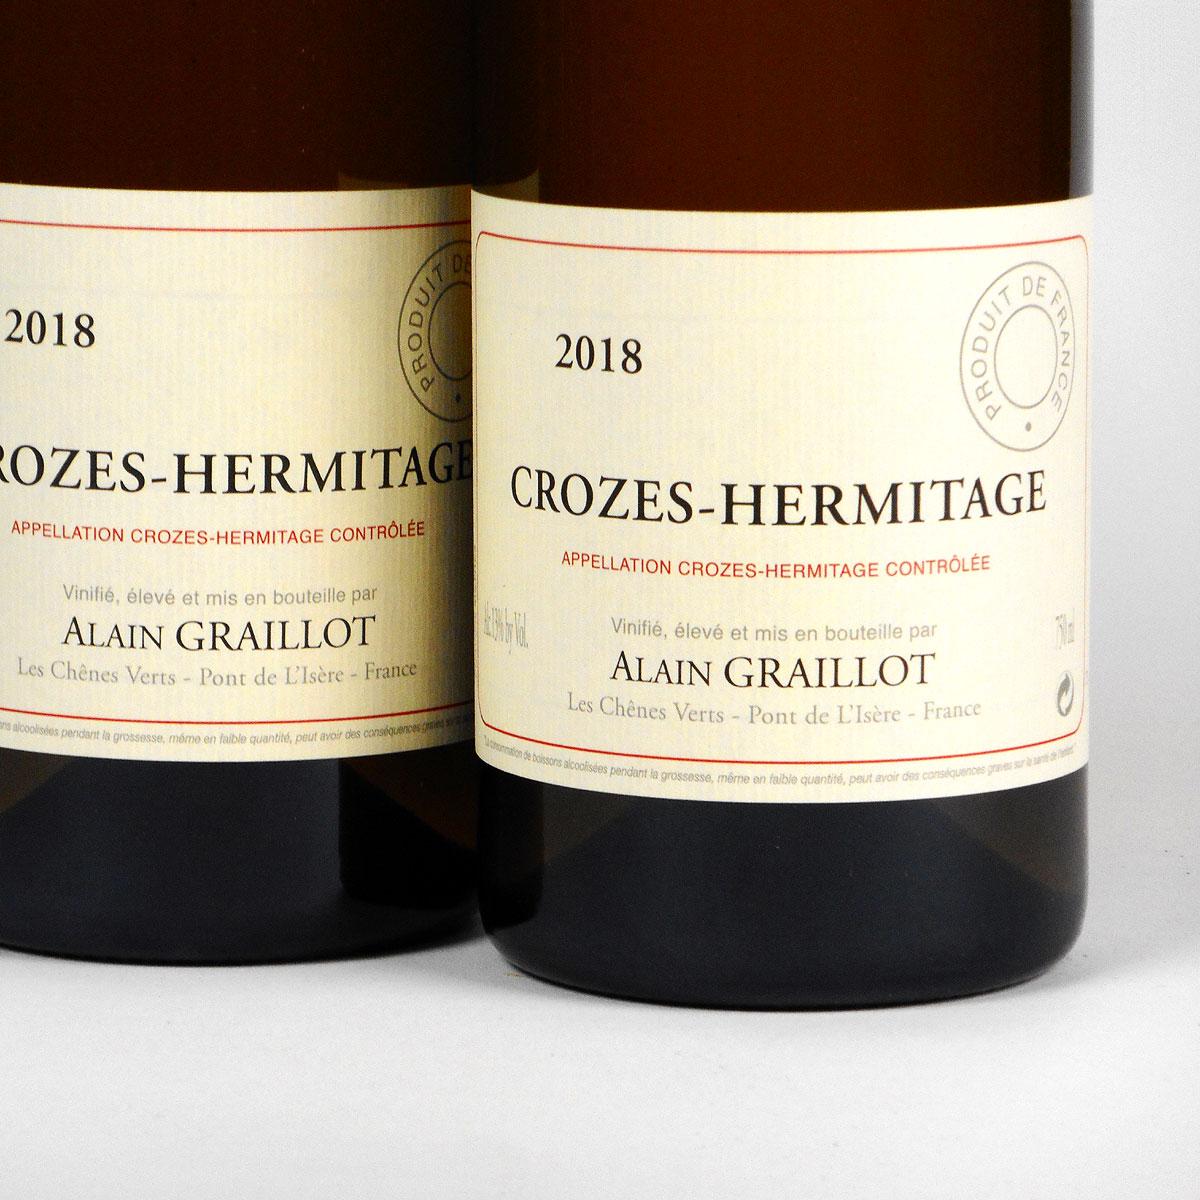 Crozes Hermitage Blanc: Alain Graillot 2018